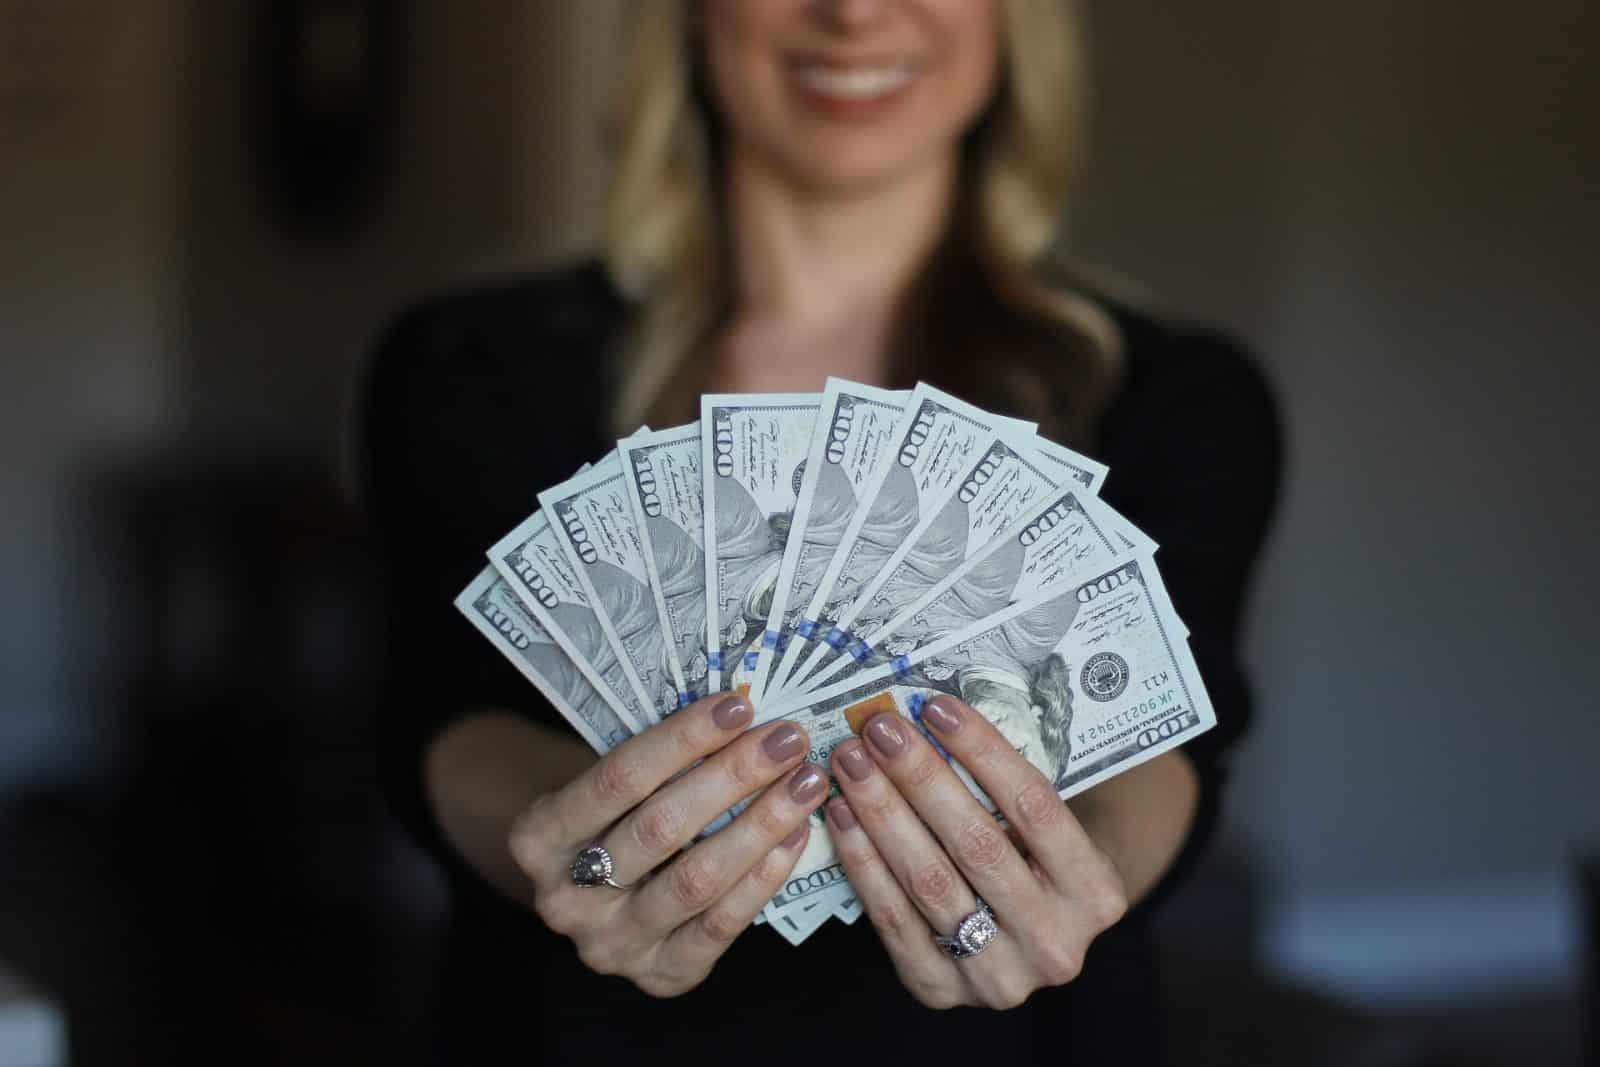 Les femmes demandent-elles des salaires trop bas?